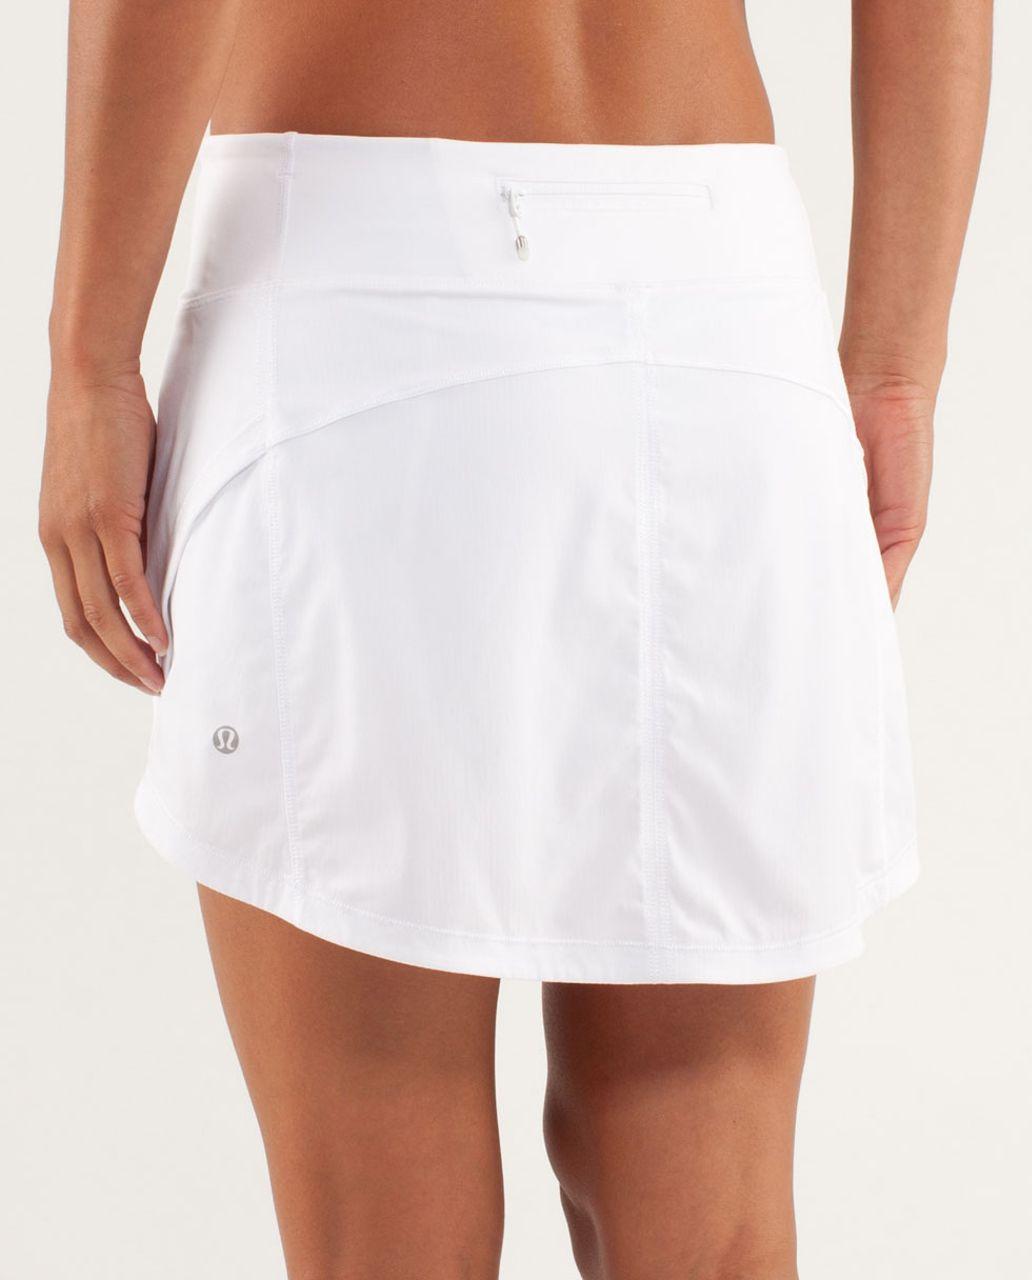 Lululemon Full Stride Skirt (Tall) - White - lulu fanatics